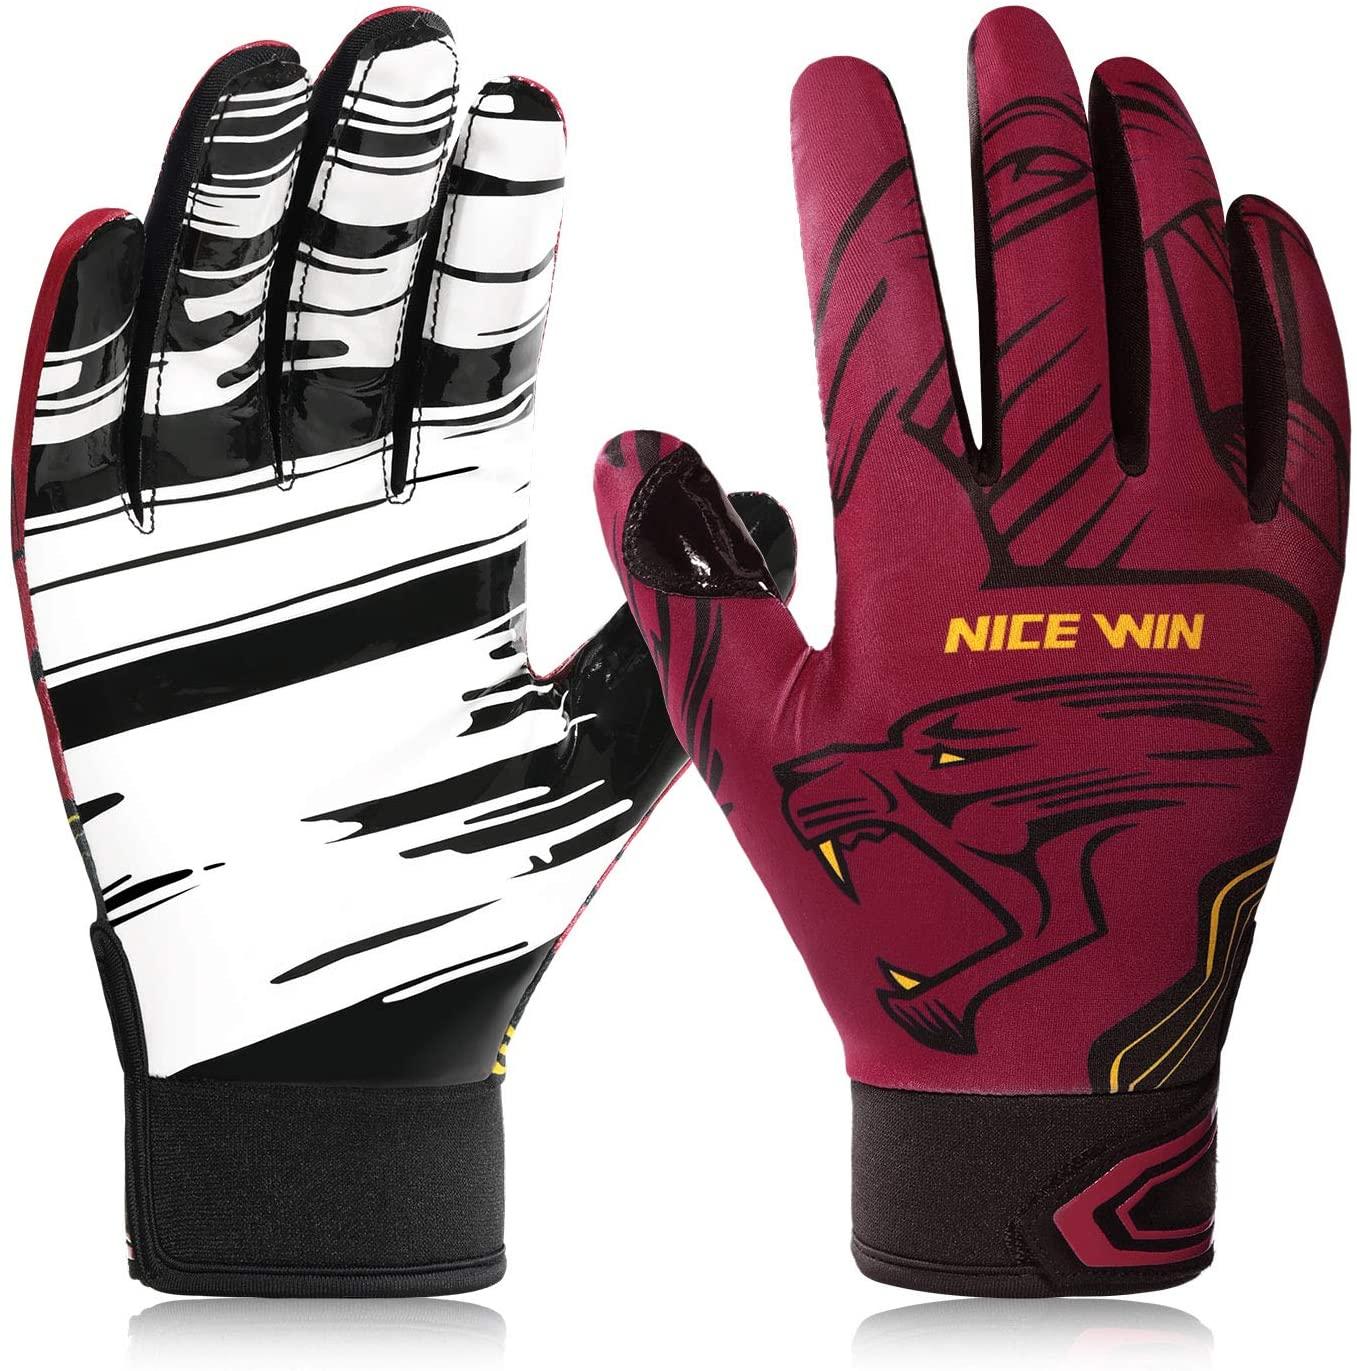 NICEWIN Football Gloves Batting Baseball Glove Fashion Leopard Print Breathable Mesh Antiskid Silicone for Adult Youth Kids Men Women